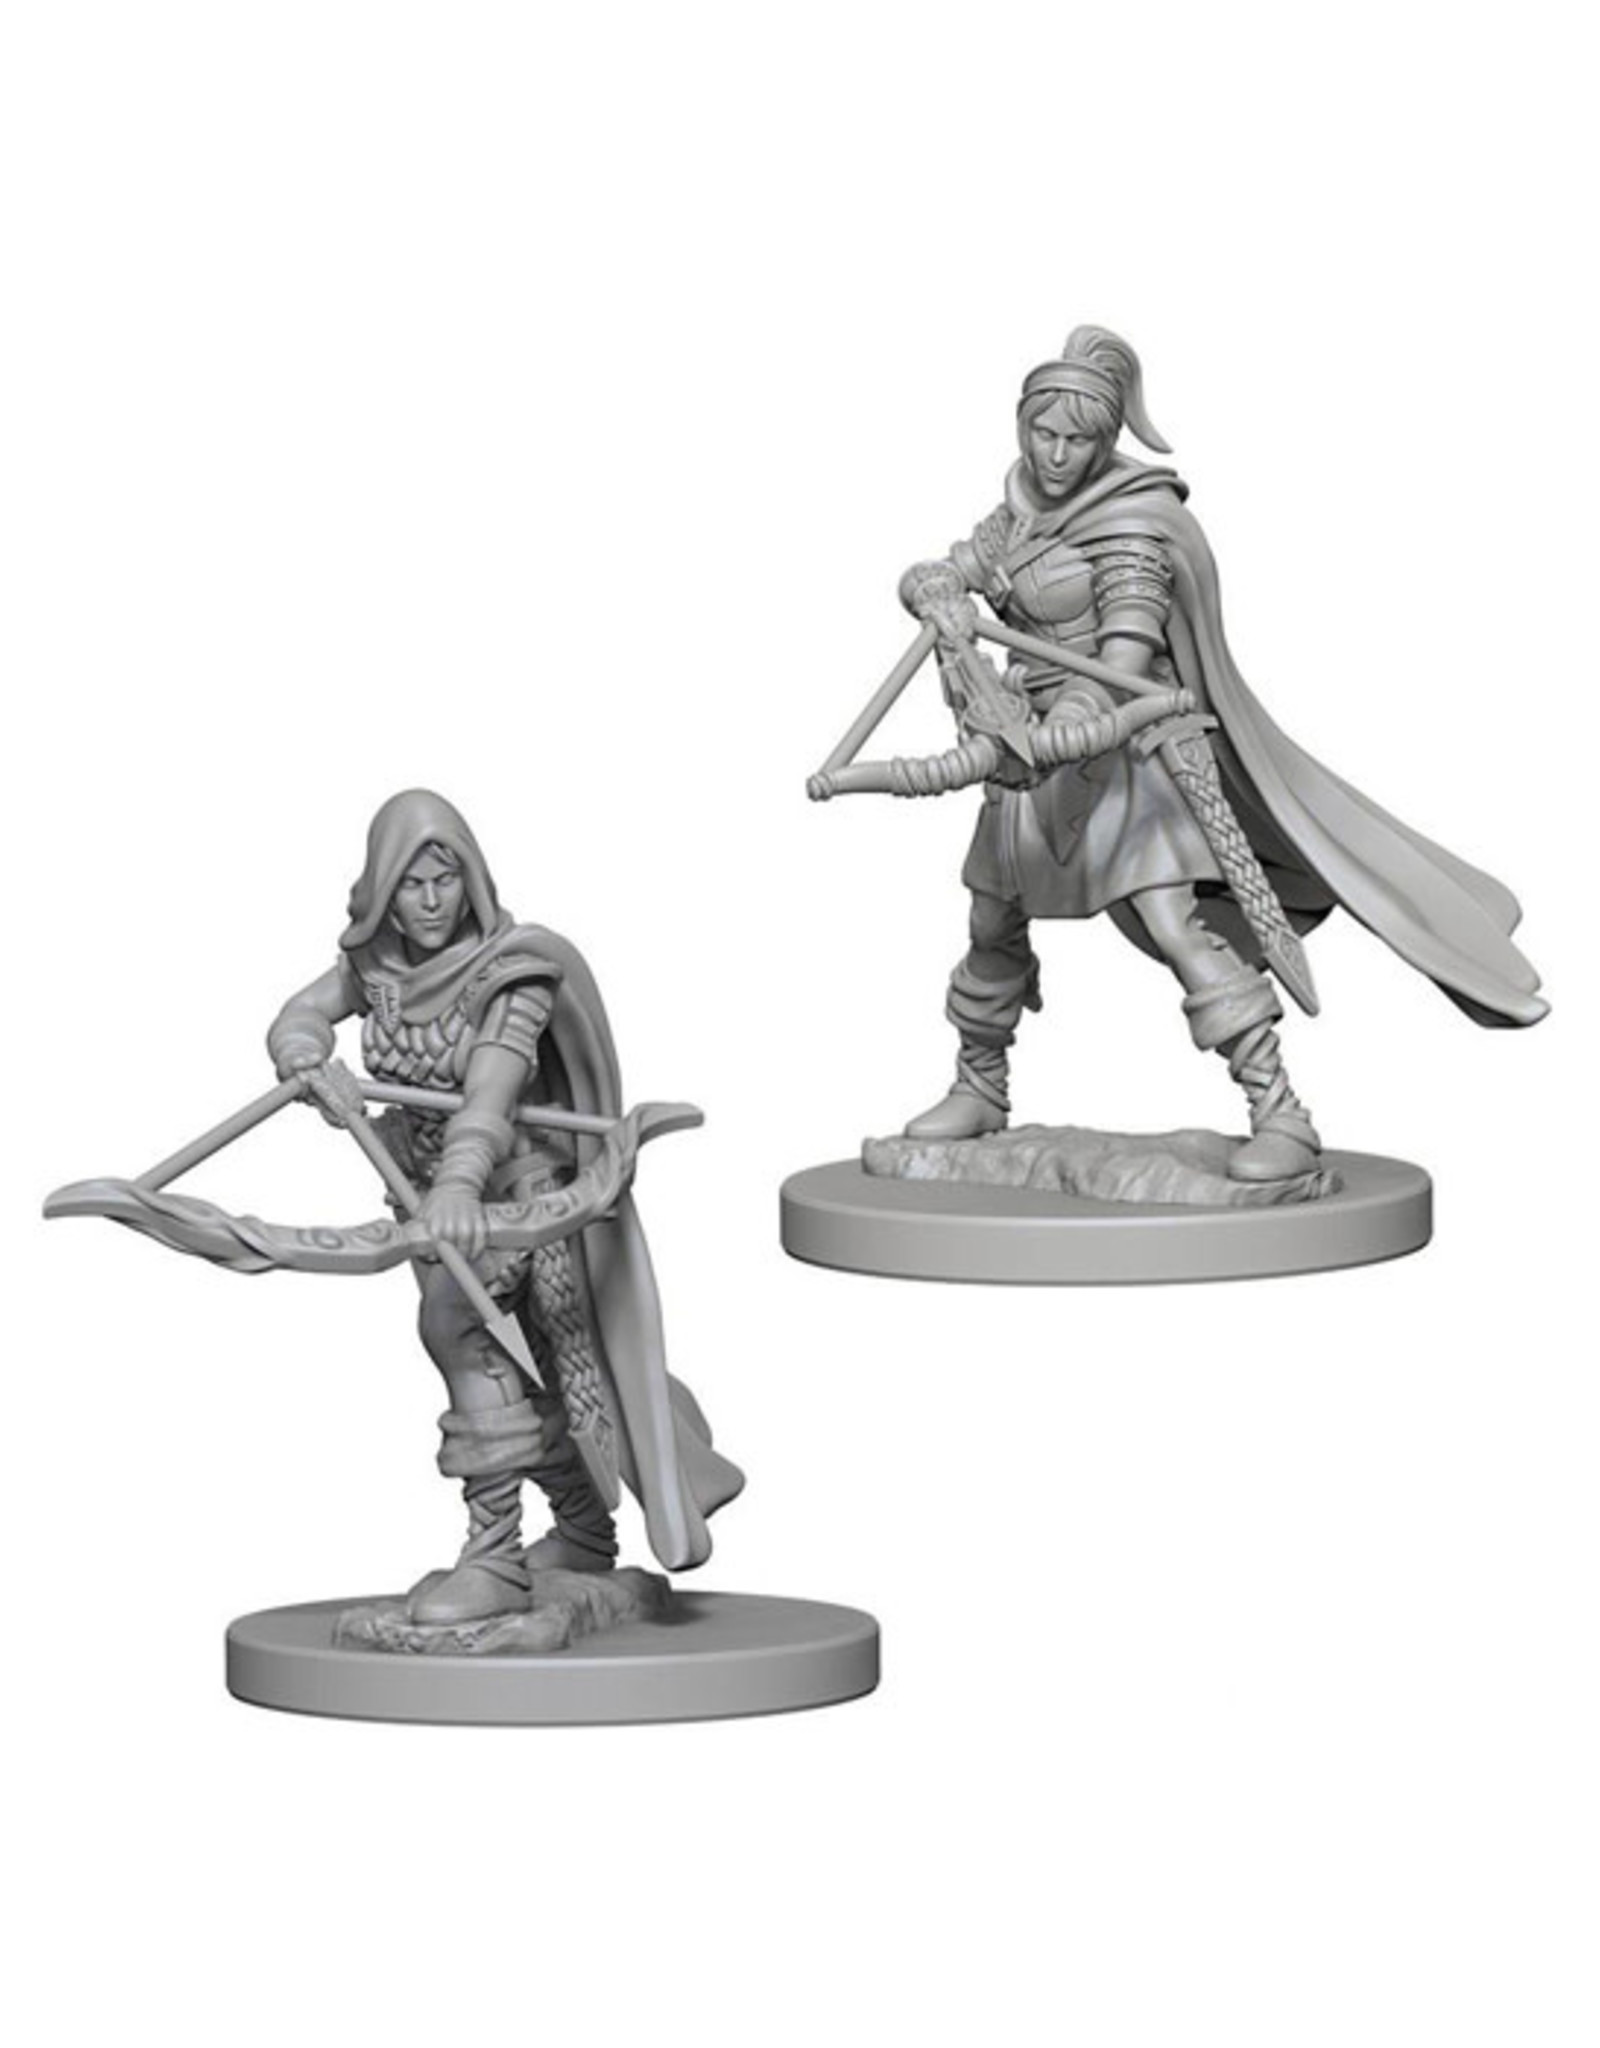 Dungeons & Dragons Dungeons & Dragons: Nolzur's - Human Female Ranger